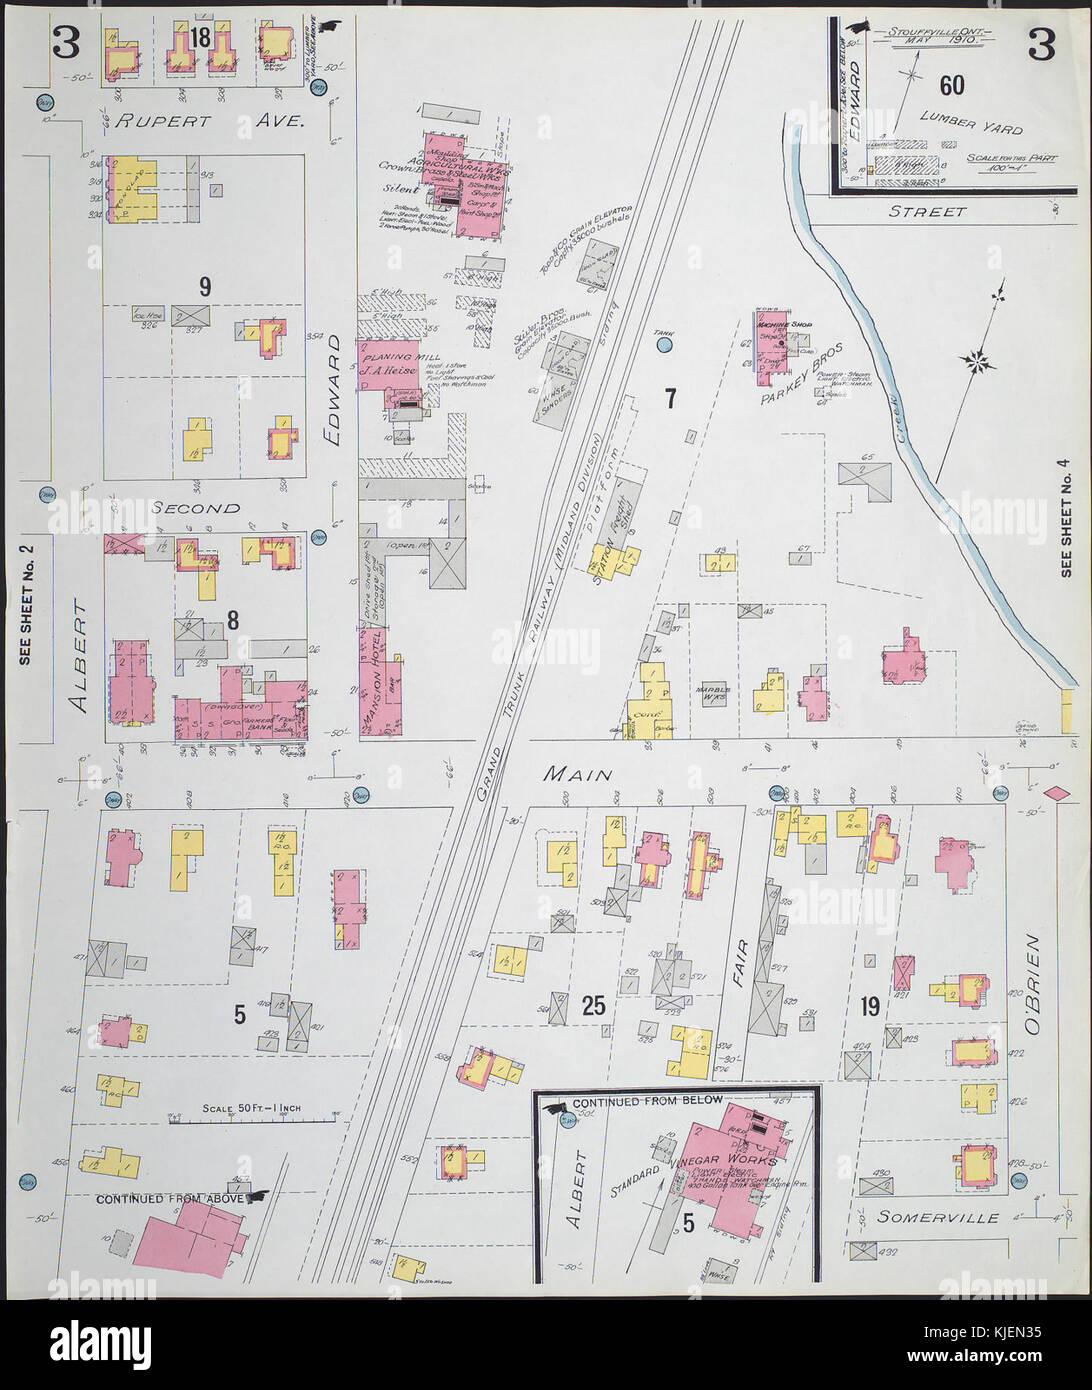 Fire Insurance Map Stouffville Ontario Sheet 3 1910 Stock Photo